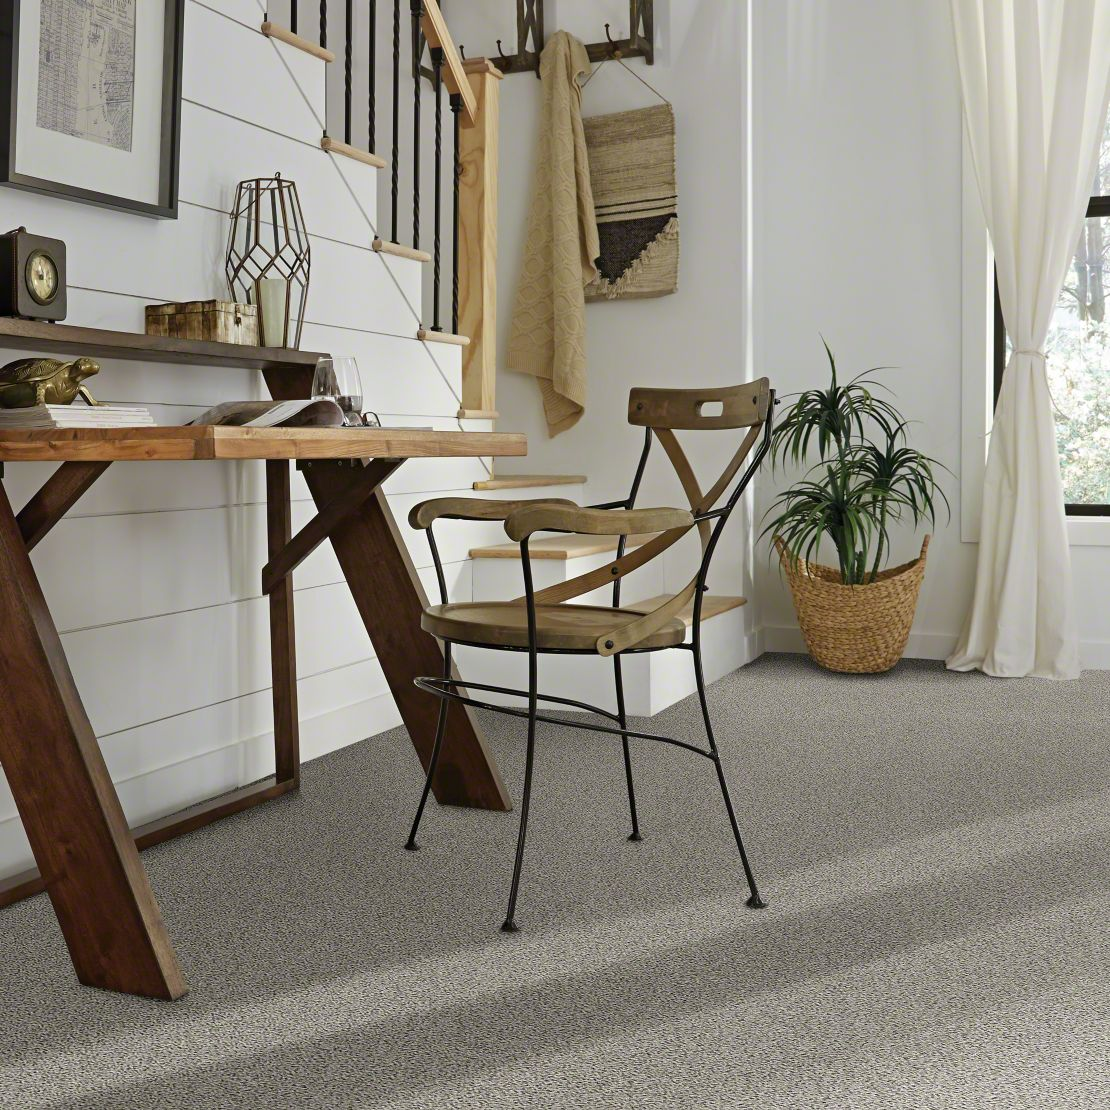 Moro carpet flooring | Andy's 5 Star Flooring